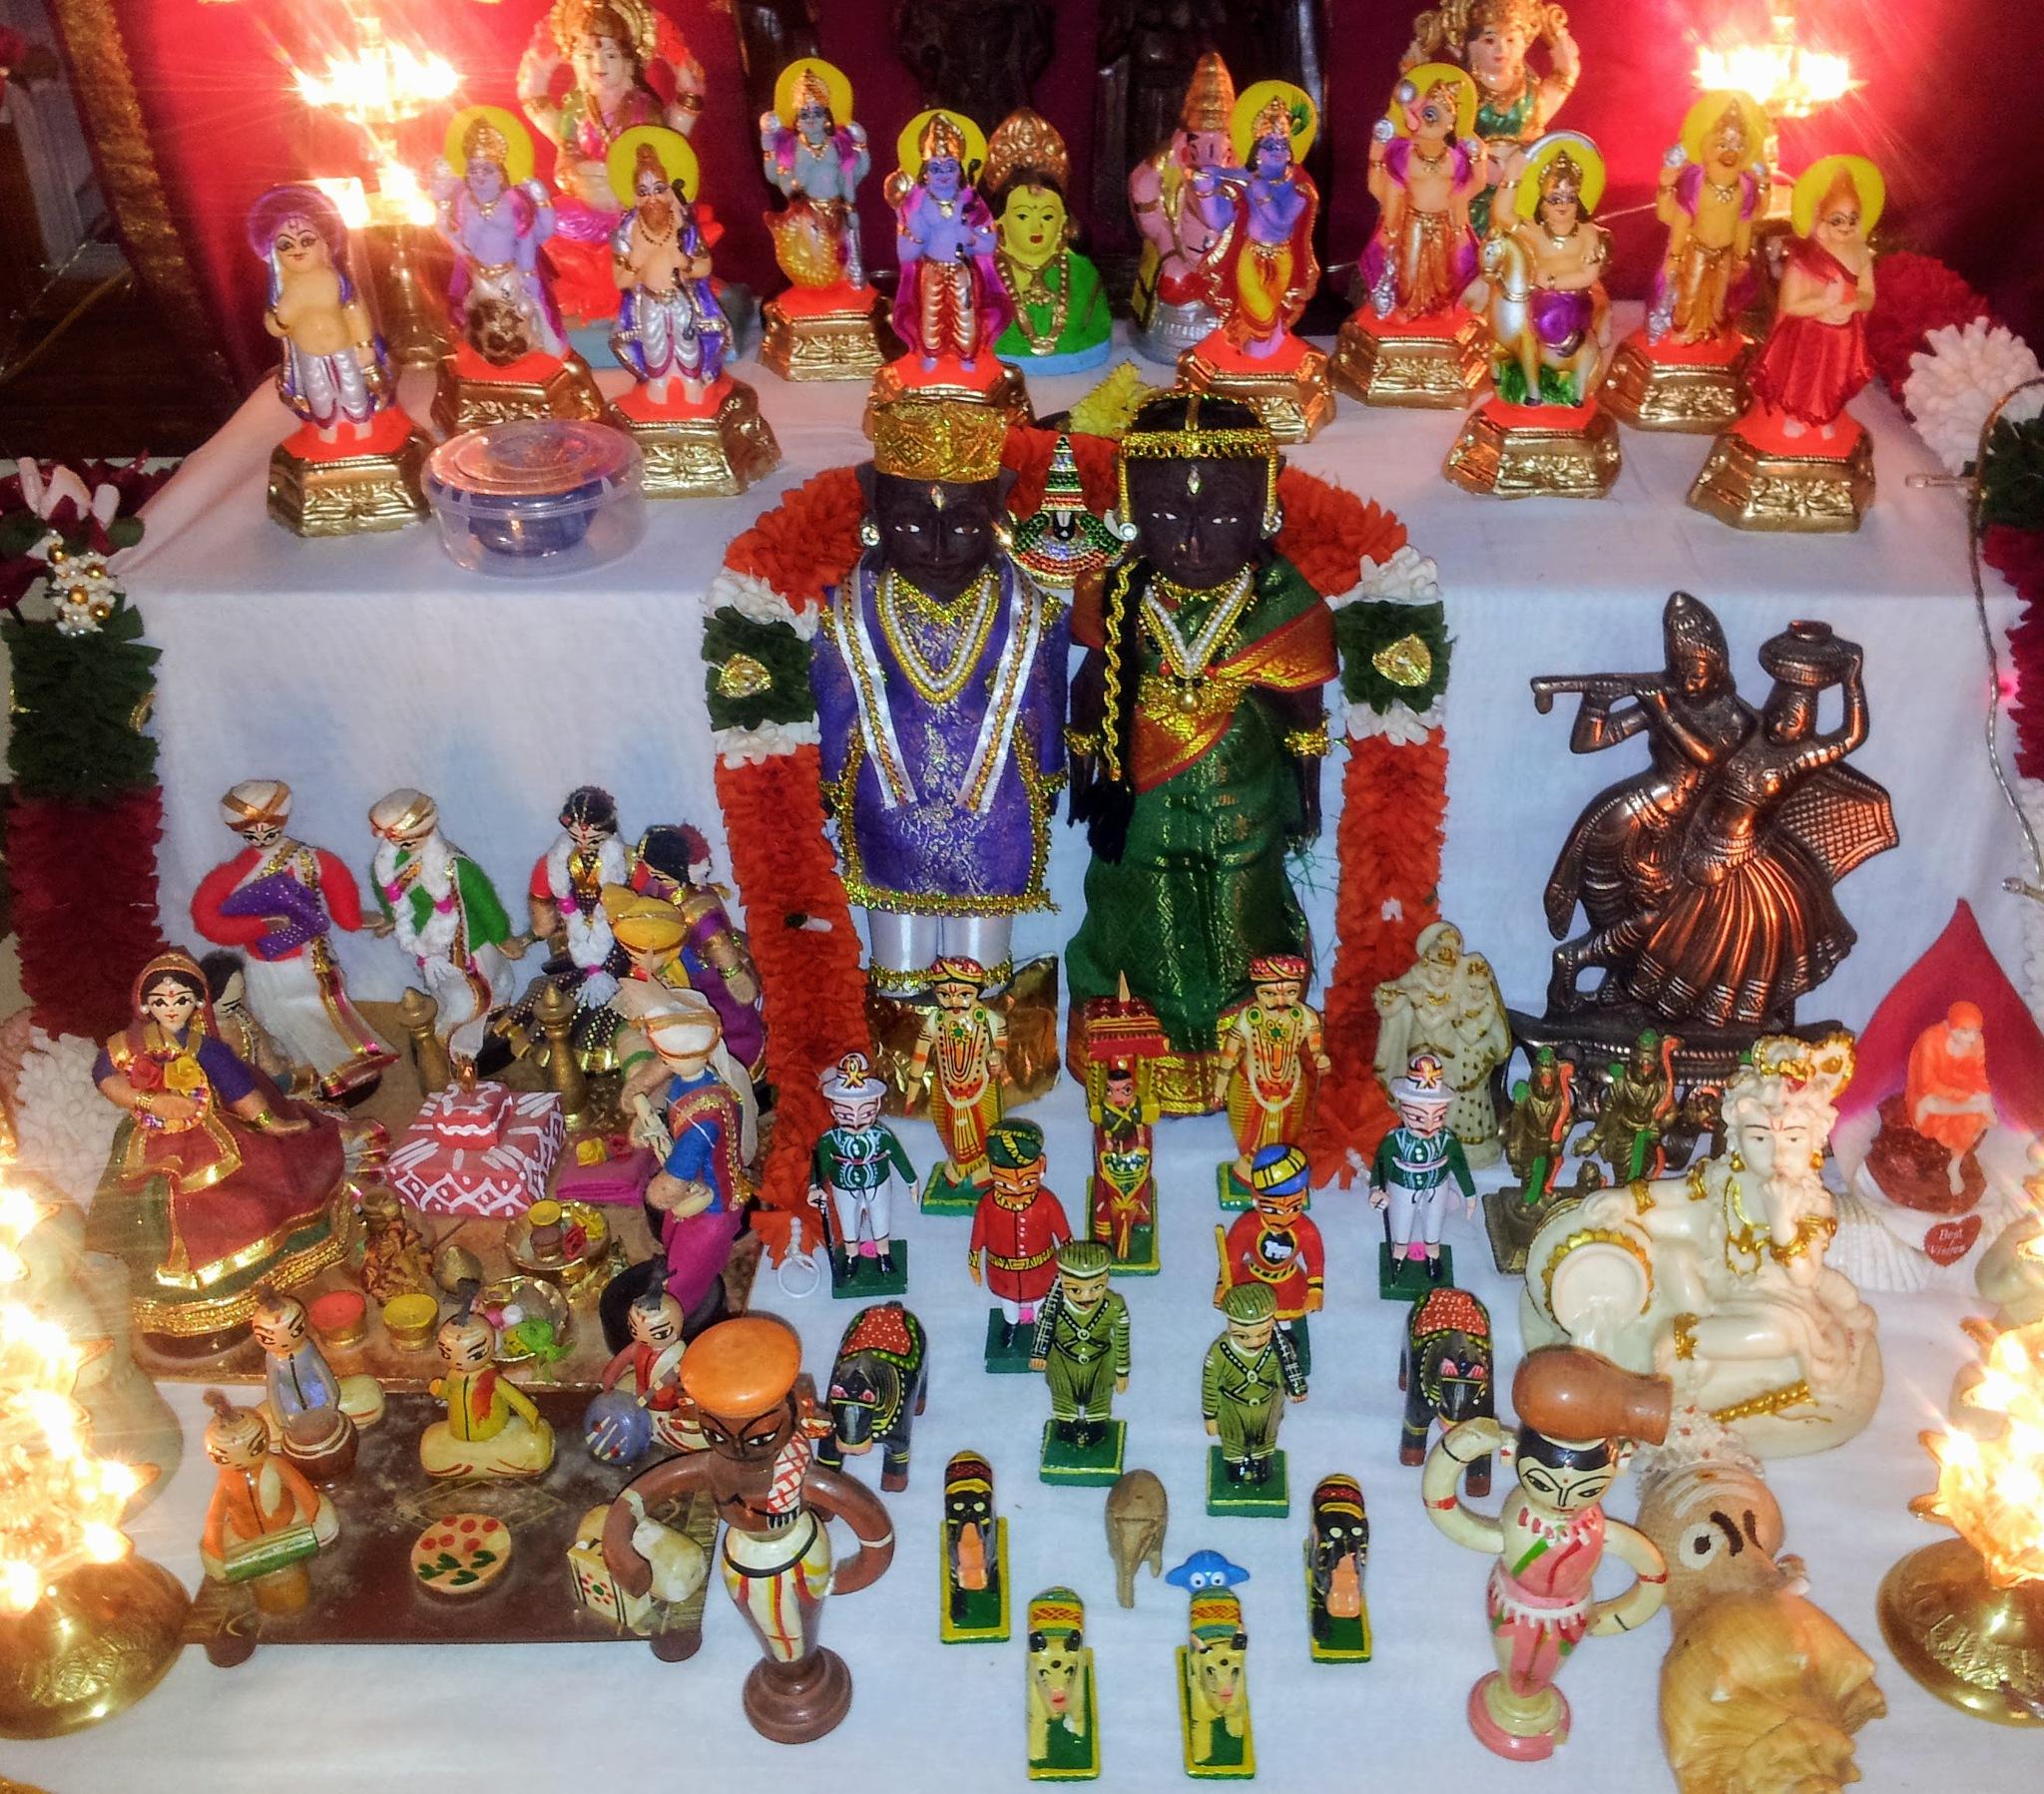 Traditional Indian toys by RajeshwarPuvvada